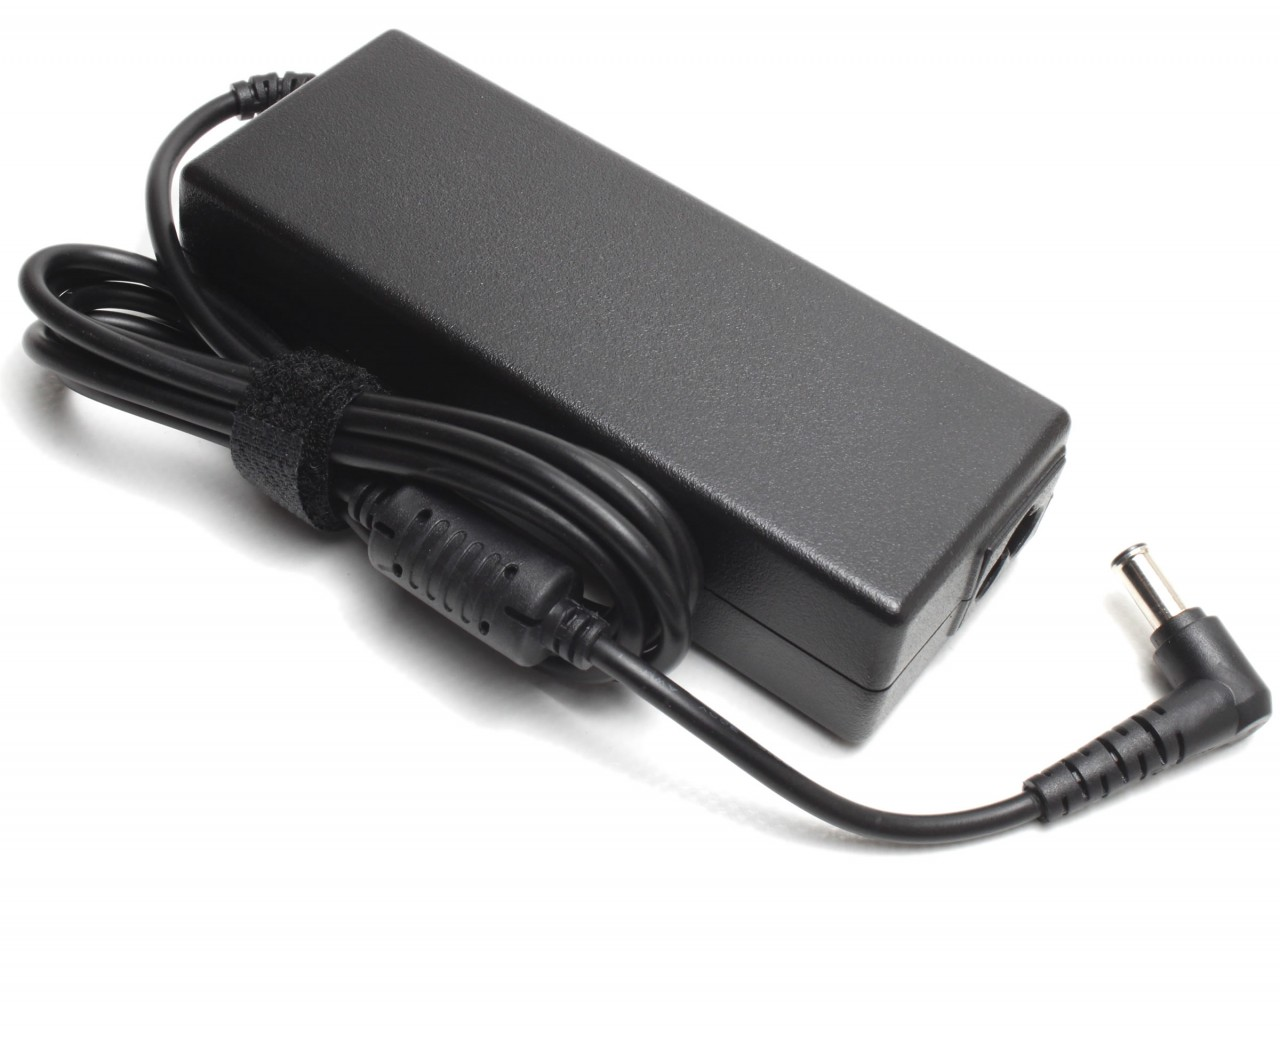 Incarcator Sony Vaio VGN FZ145 Replacement imagine powerlaptop.ro 2021